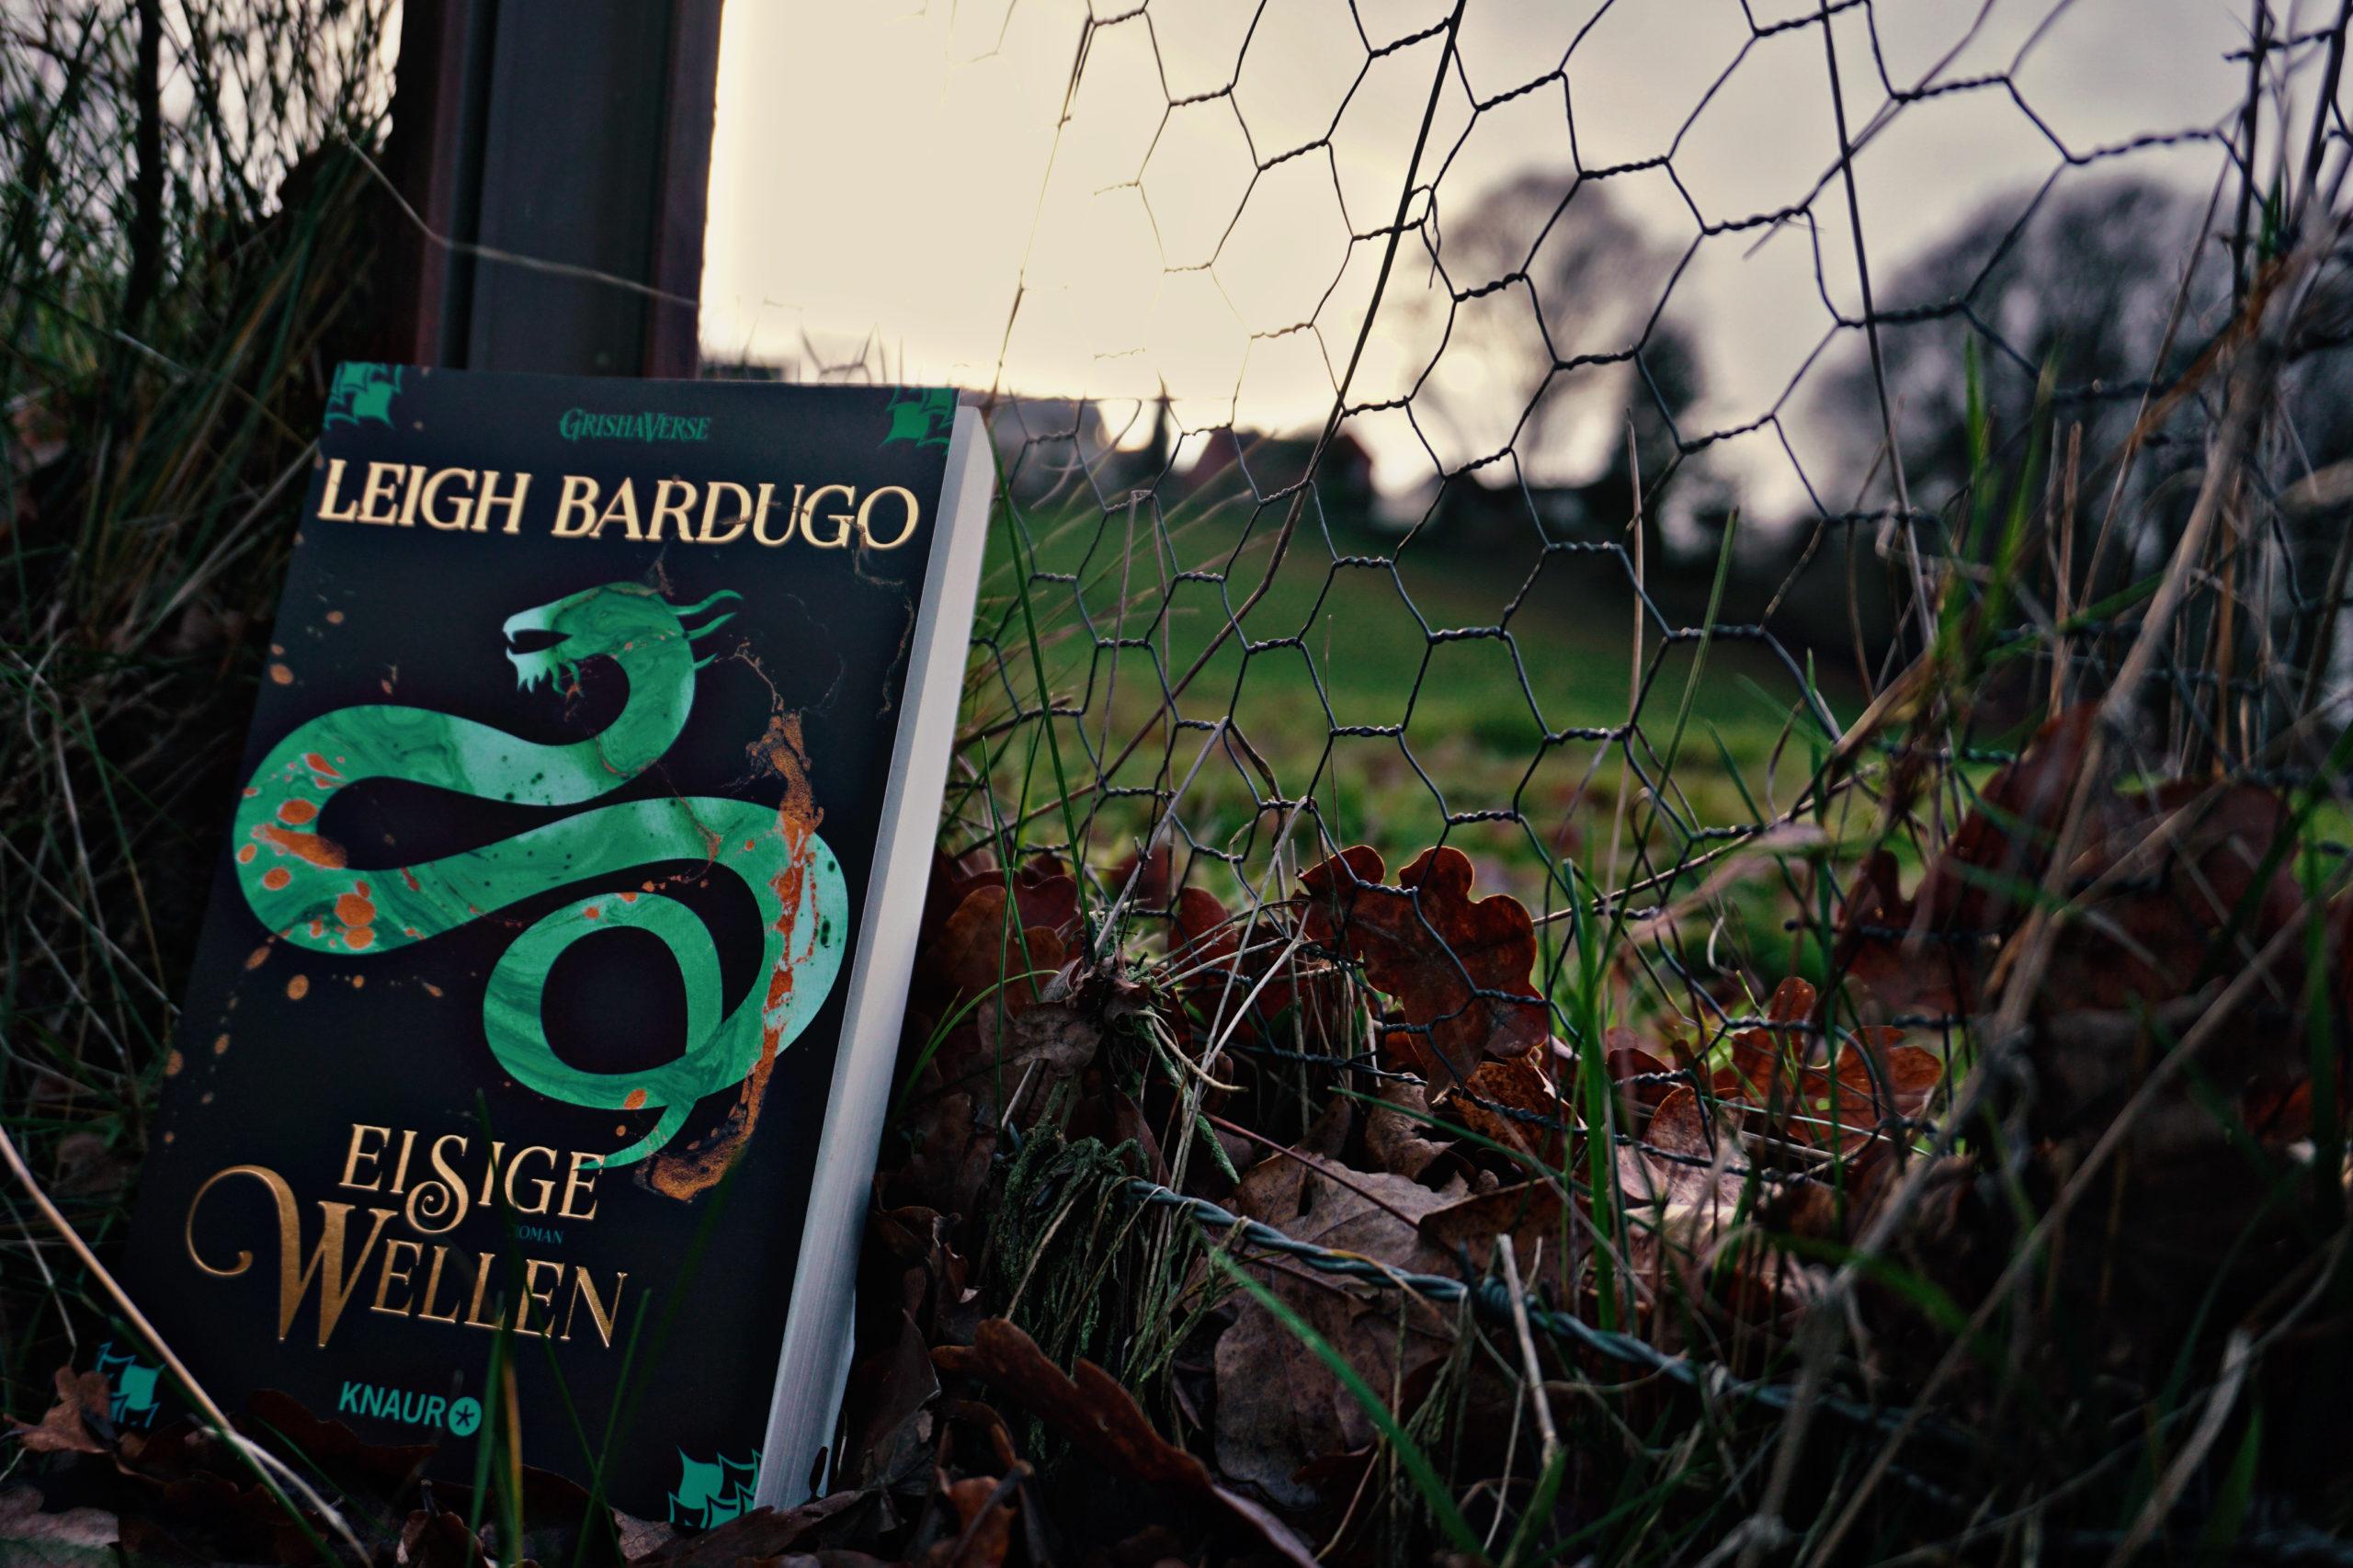 Eisige Wellen – Leigh Bardugo